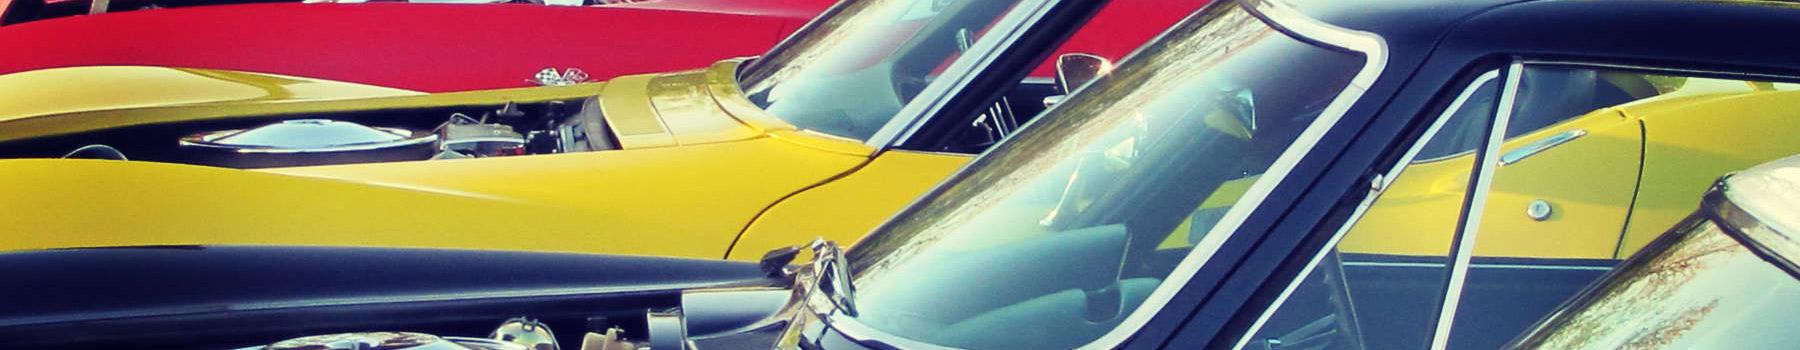 our 2015 car show